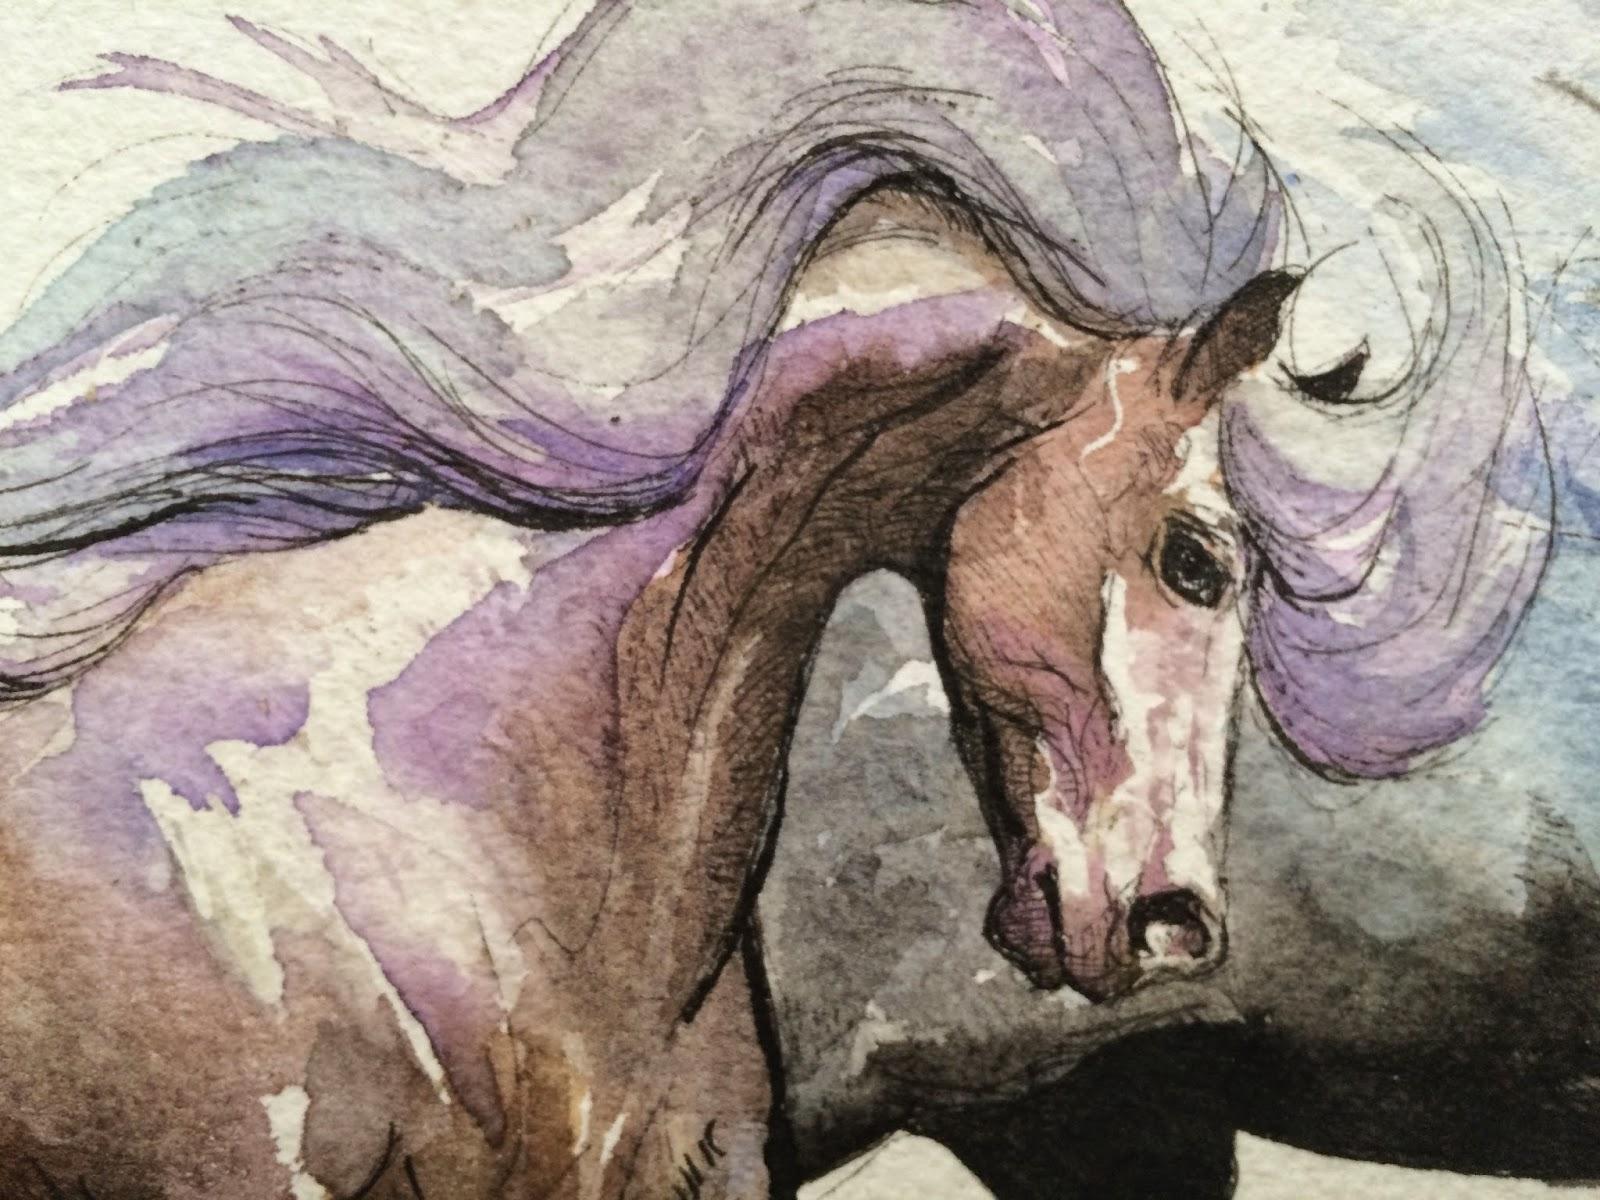 Cool   Wallpaper Horse Watercolor - TwoC%2BWC%2BhorsesProcess11  HD_85837.jpg